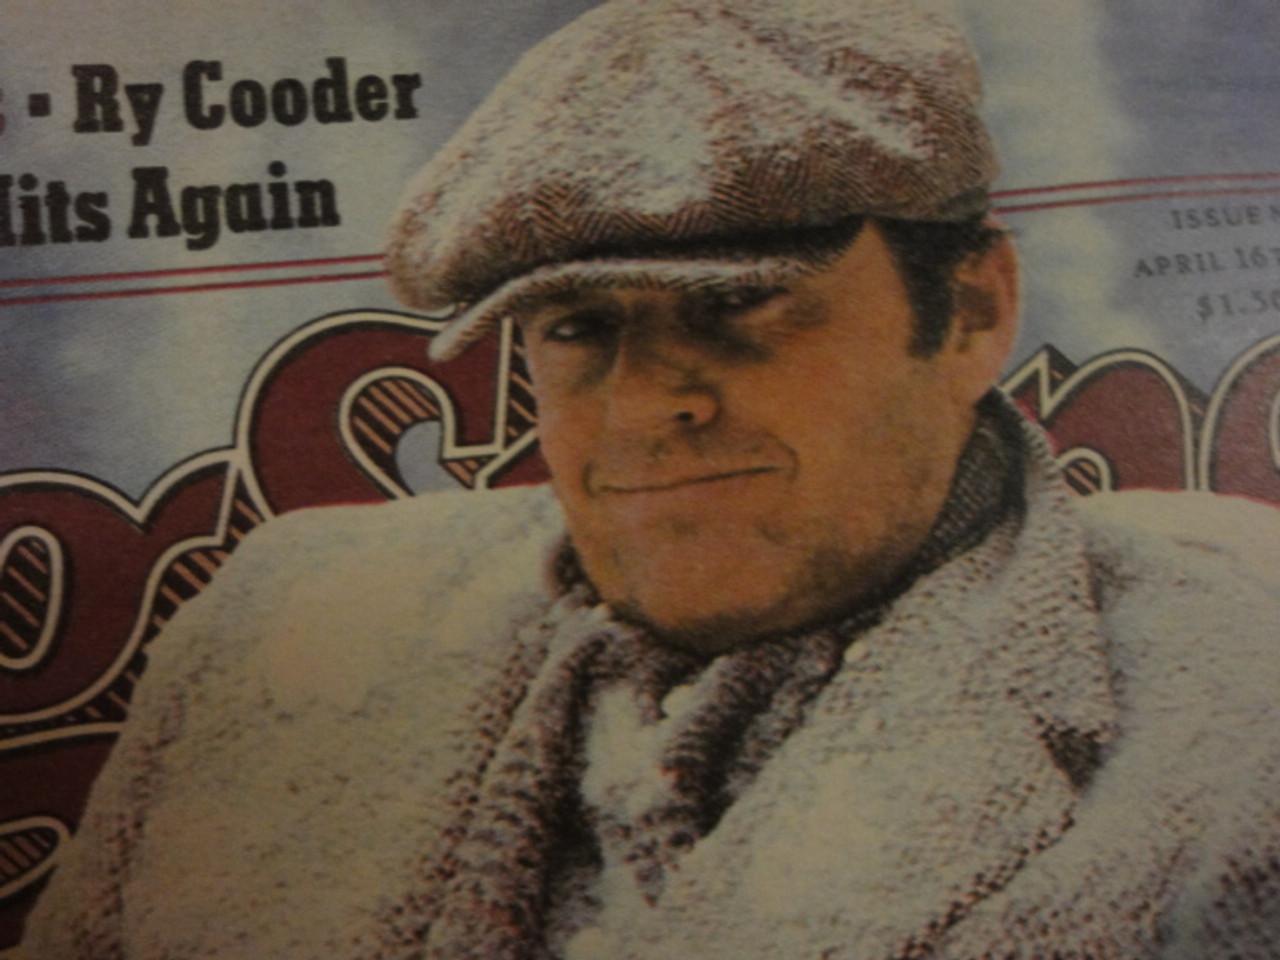 Nicholson, Jack Rolling Stone Magazine 1981 Signed Autograph Color Cover Photo